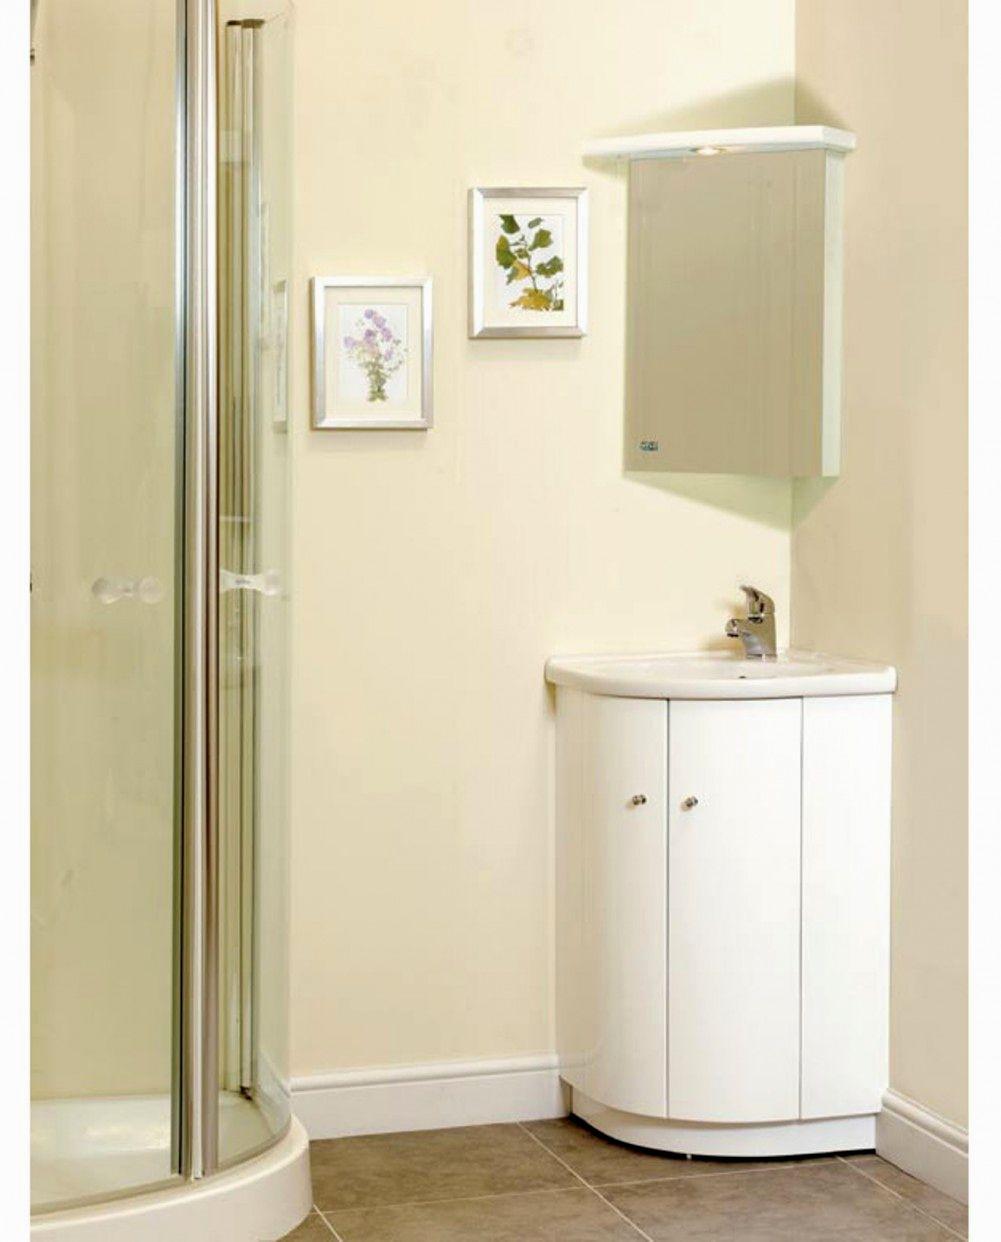 Modern Cherry Bathroom Wall Cabinet Inspiration - Bathroom Design ...